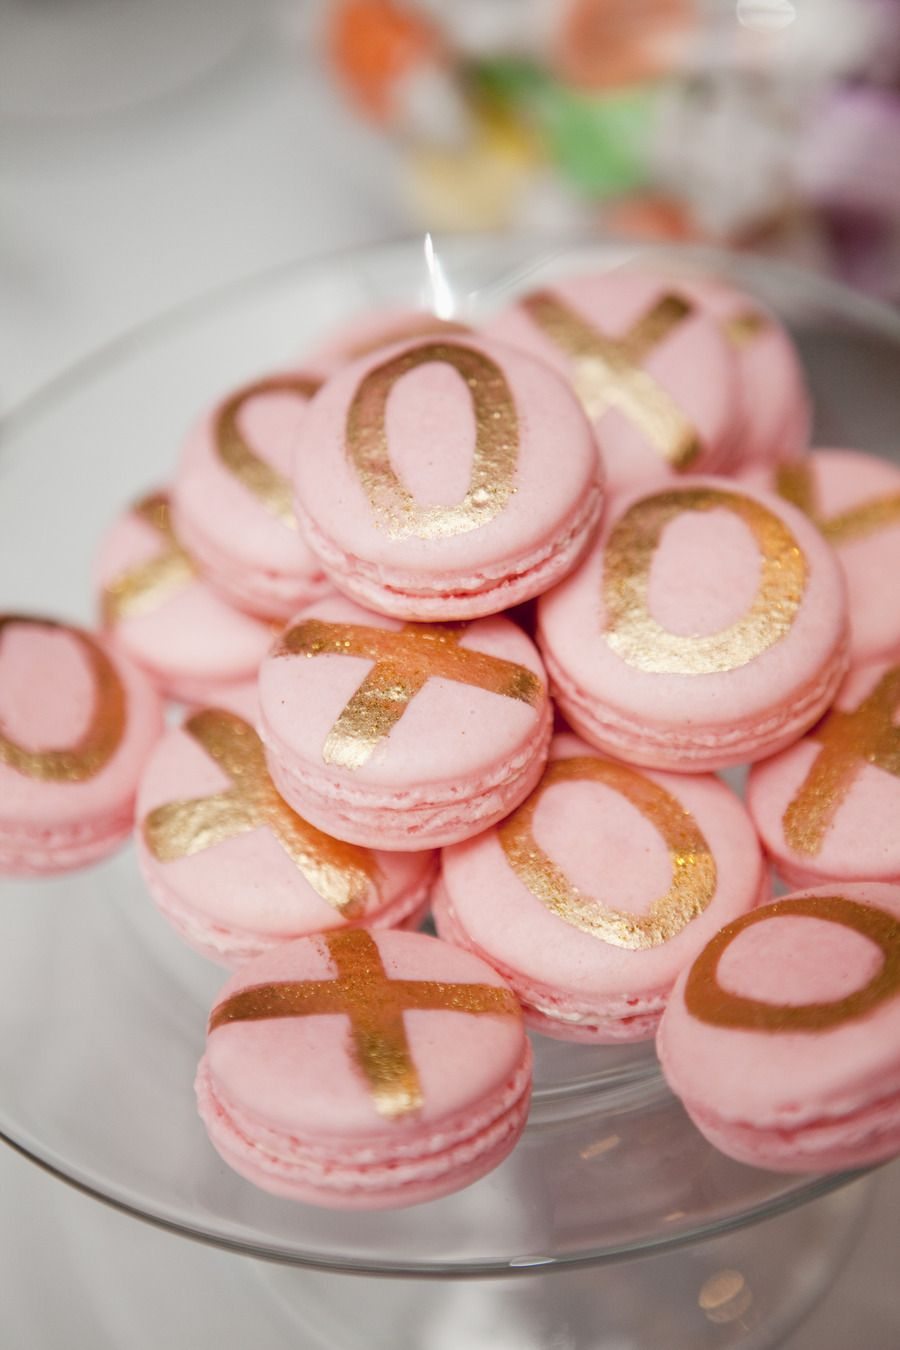 Pink Gardiner Museum Wedding | Desserts | Pinterest | Macarons ...